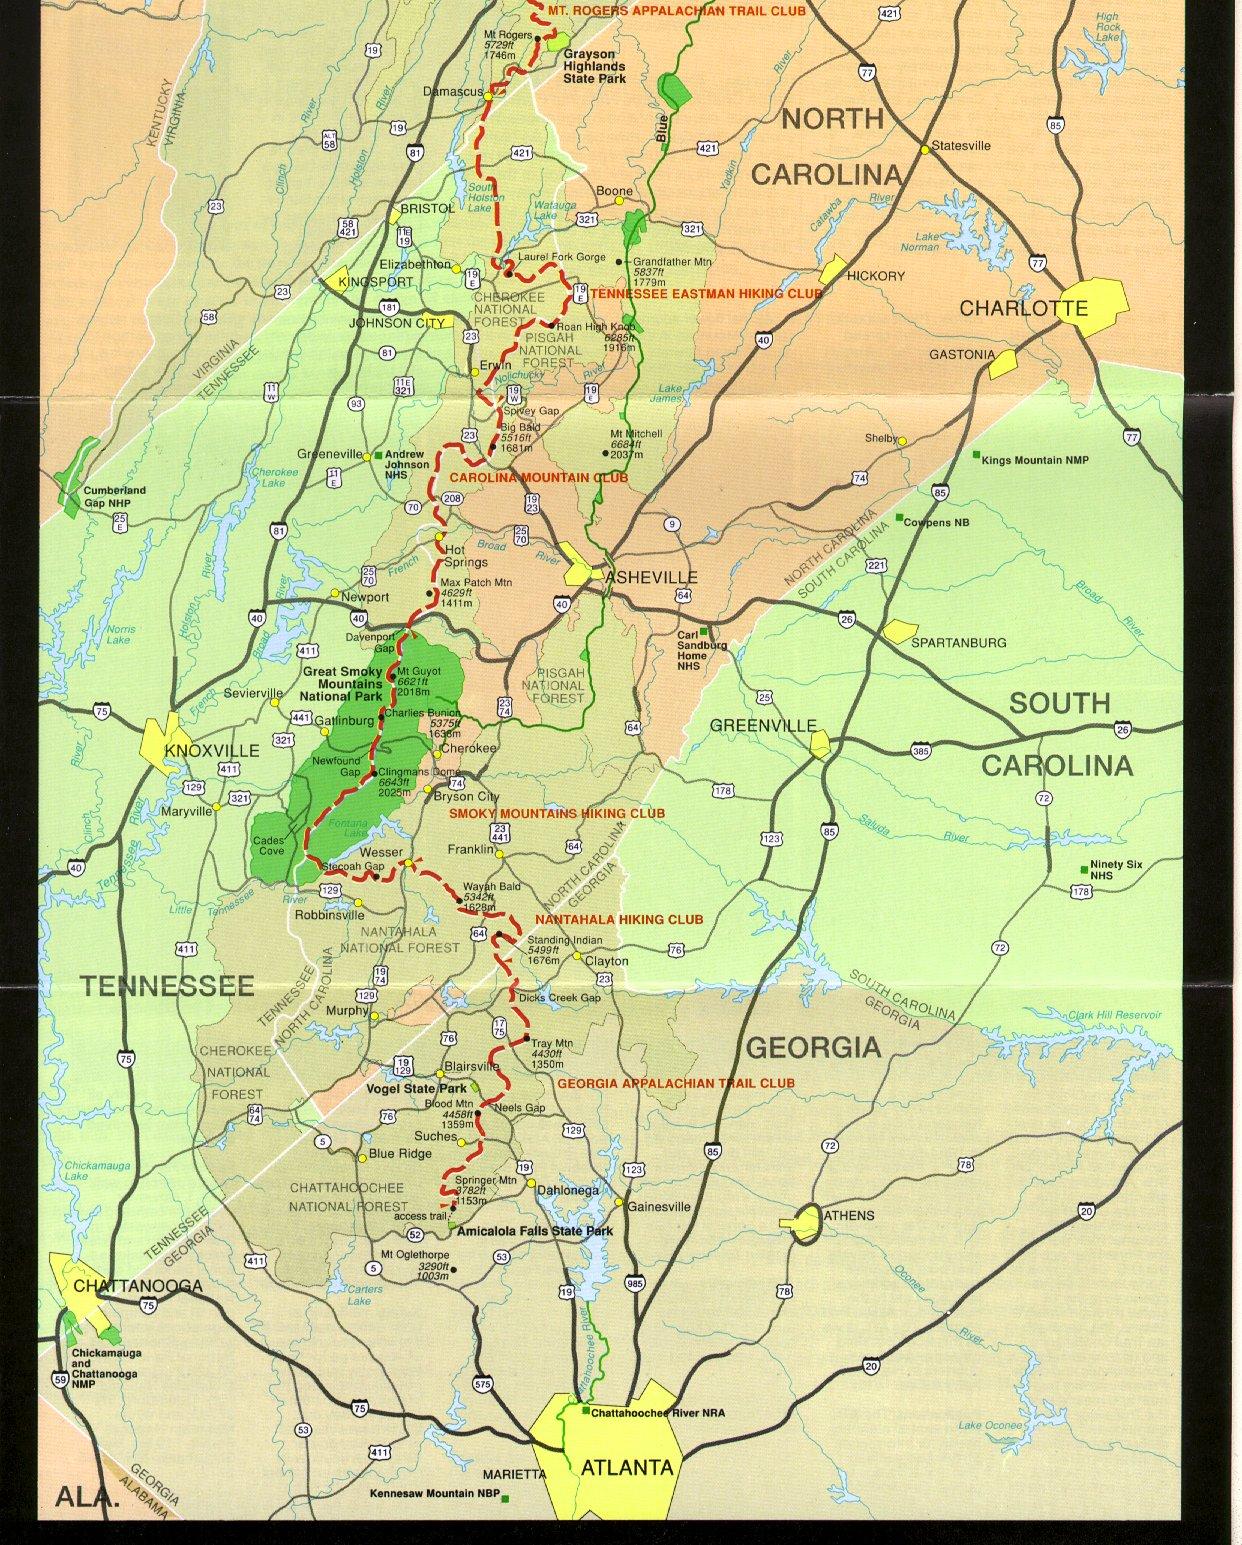 Appalachian Trail In Georgia Map.Appalachian Trail